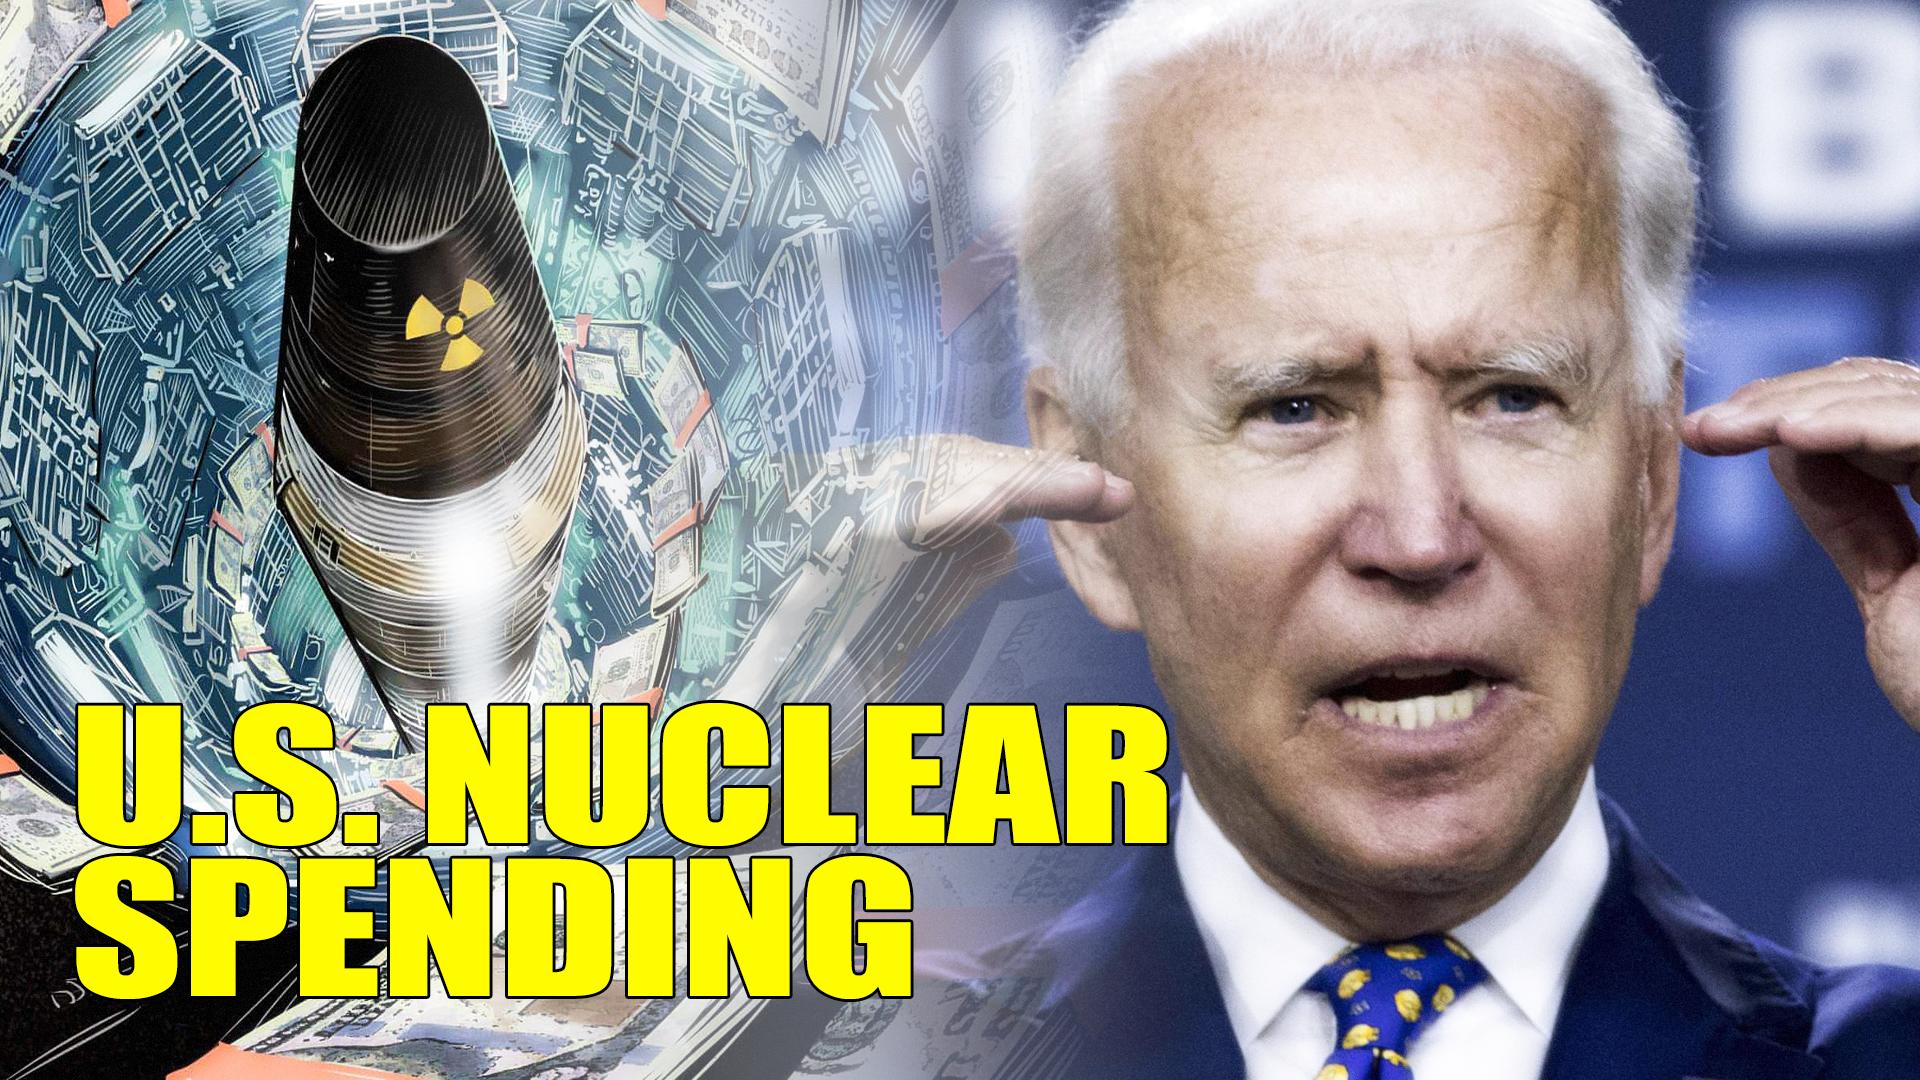 US $1.5 trillion nuclear upgrade